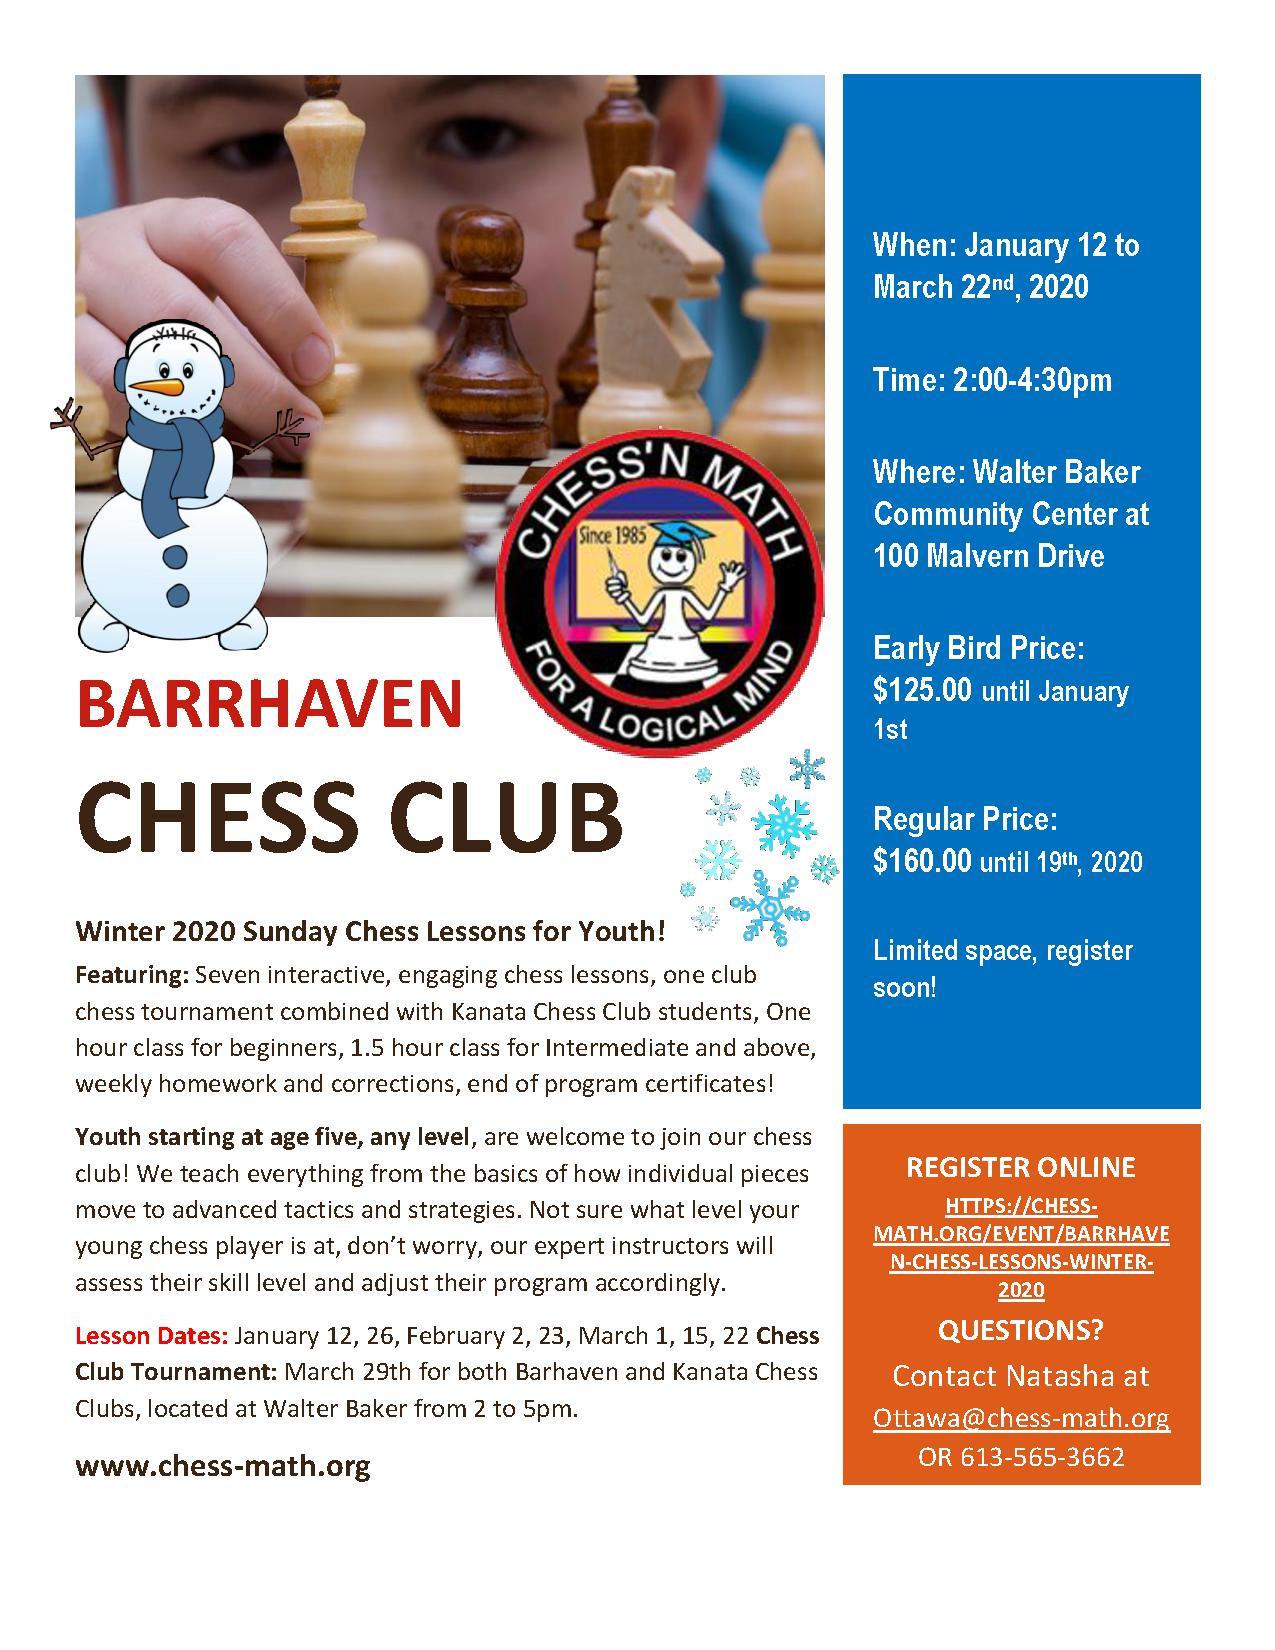 Barrhaven Sunday Chess Club Winter 2020